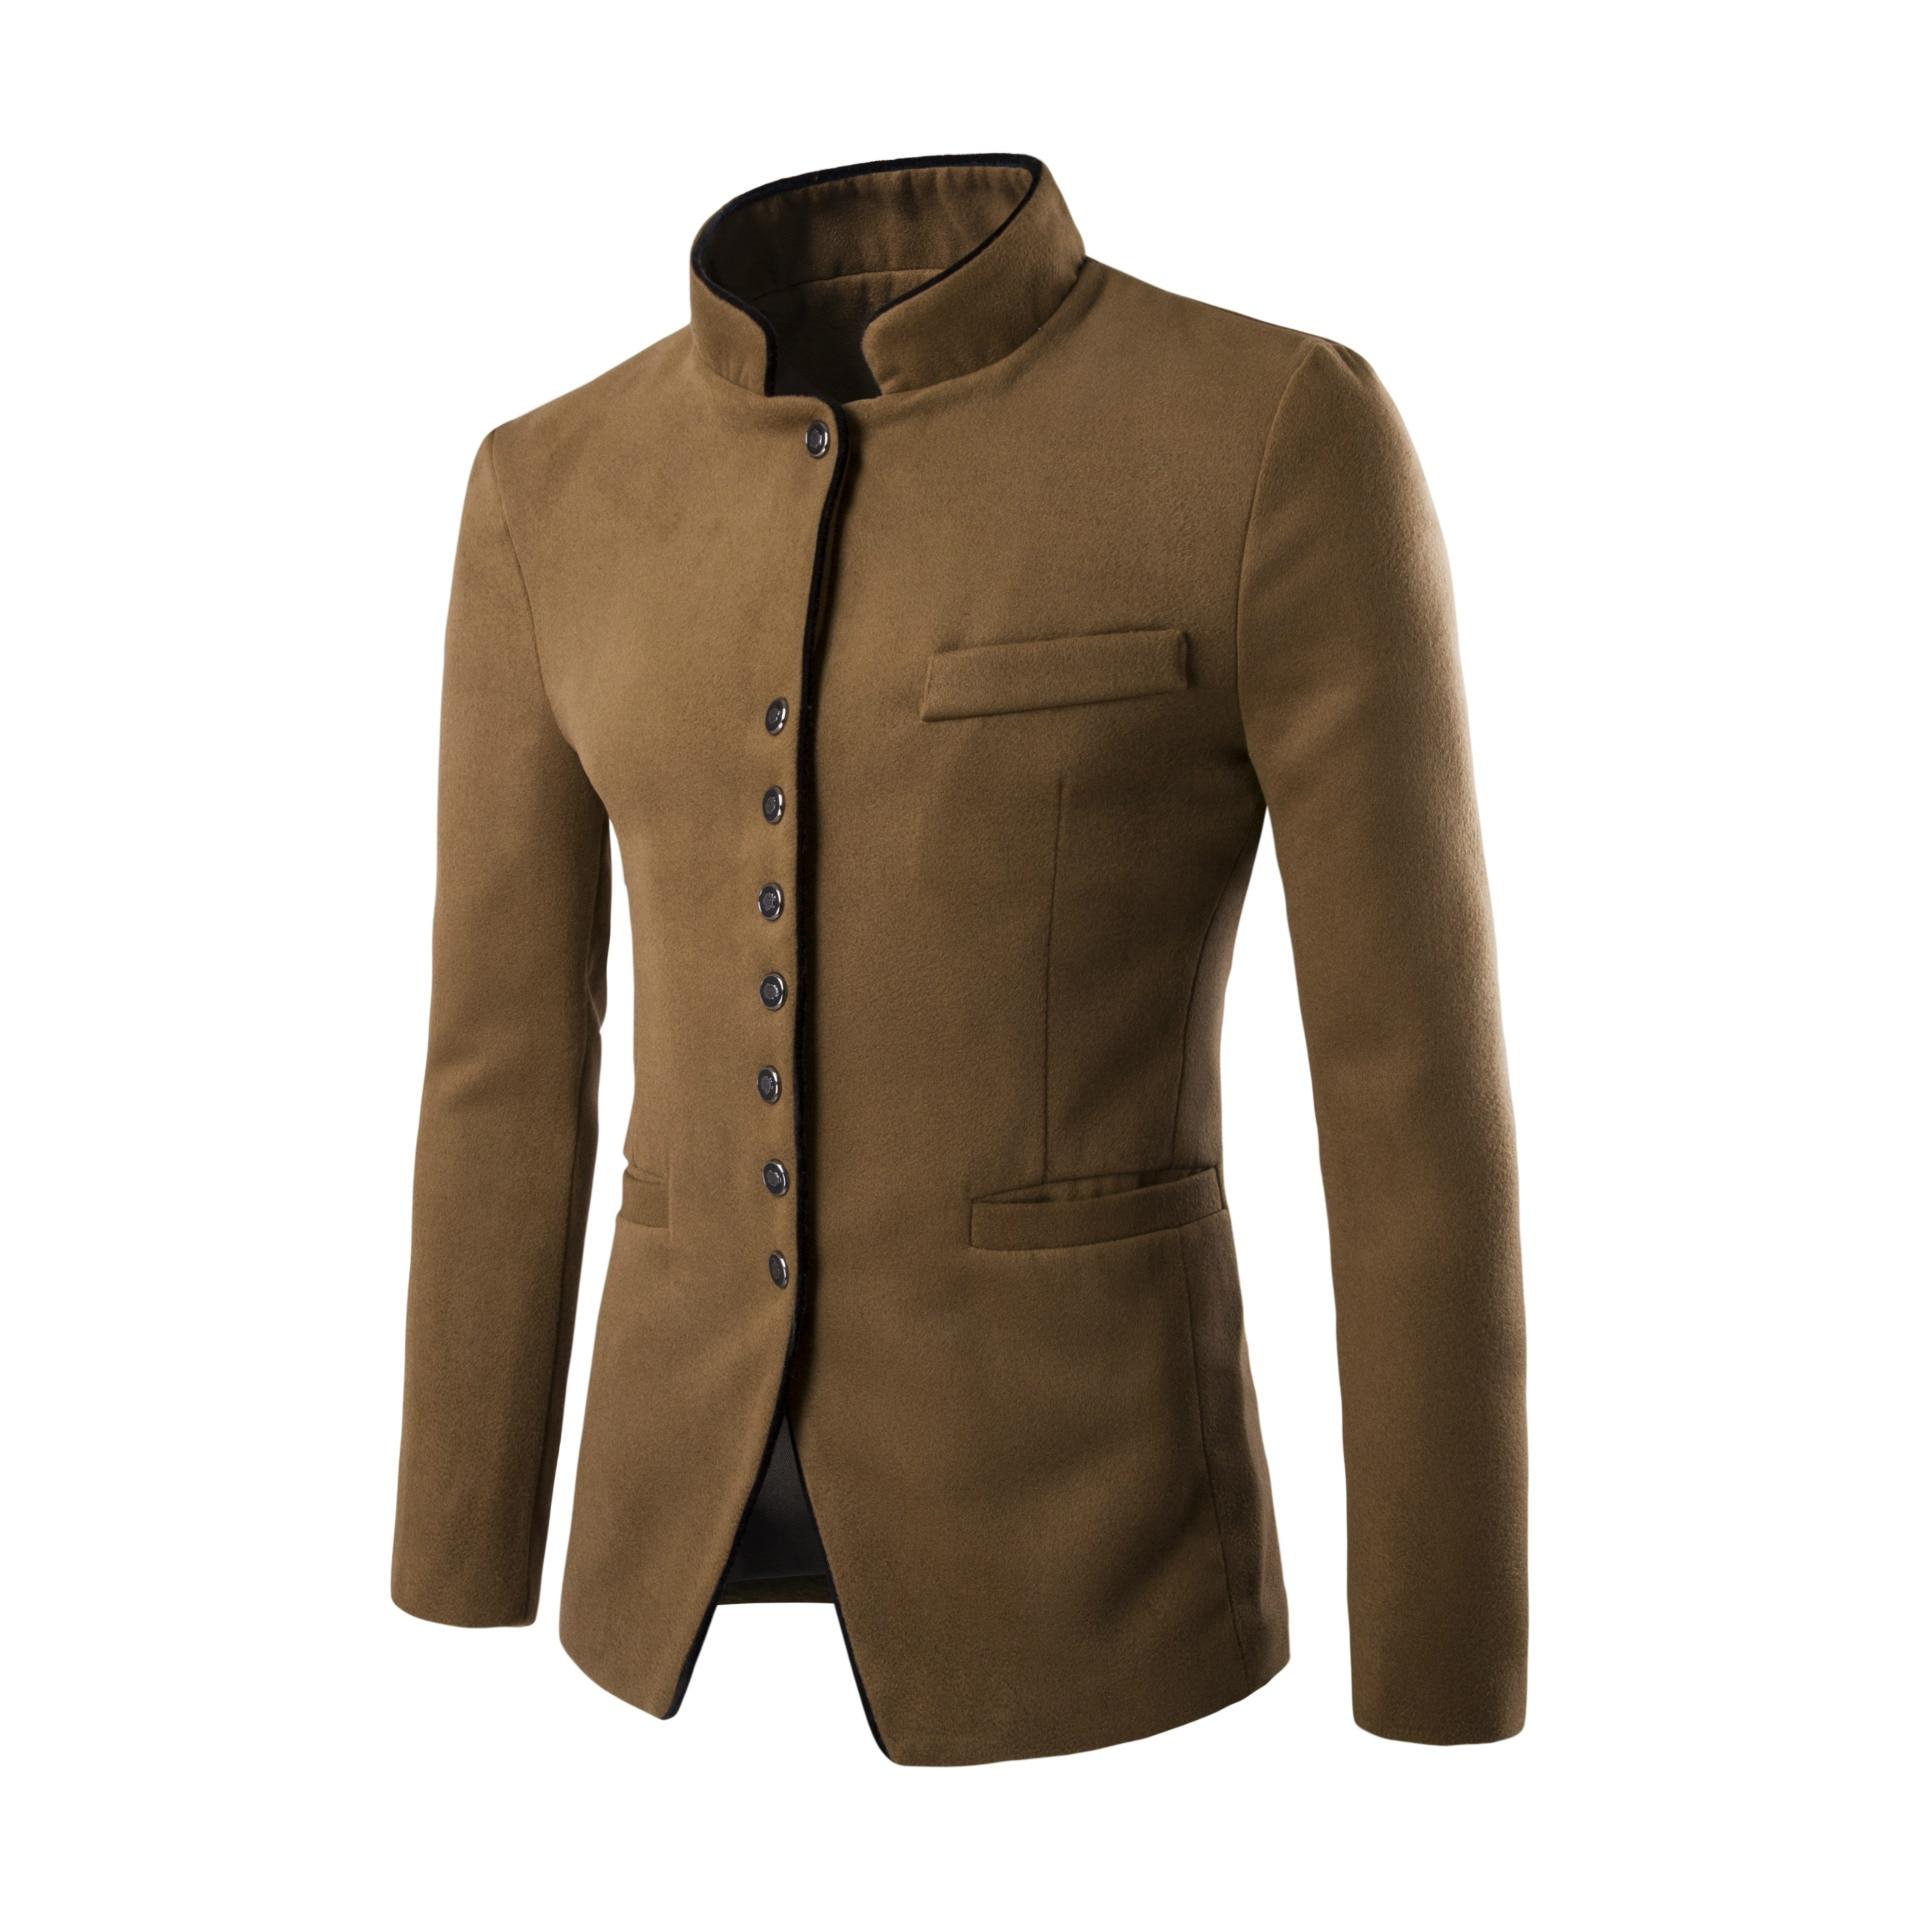 Winter Coat New Autumn Men Casual Suit Men Stand Collar Worsted Fabric Pocket Button Decorate Men'S Leisure Suit Coat